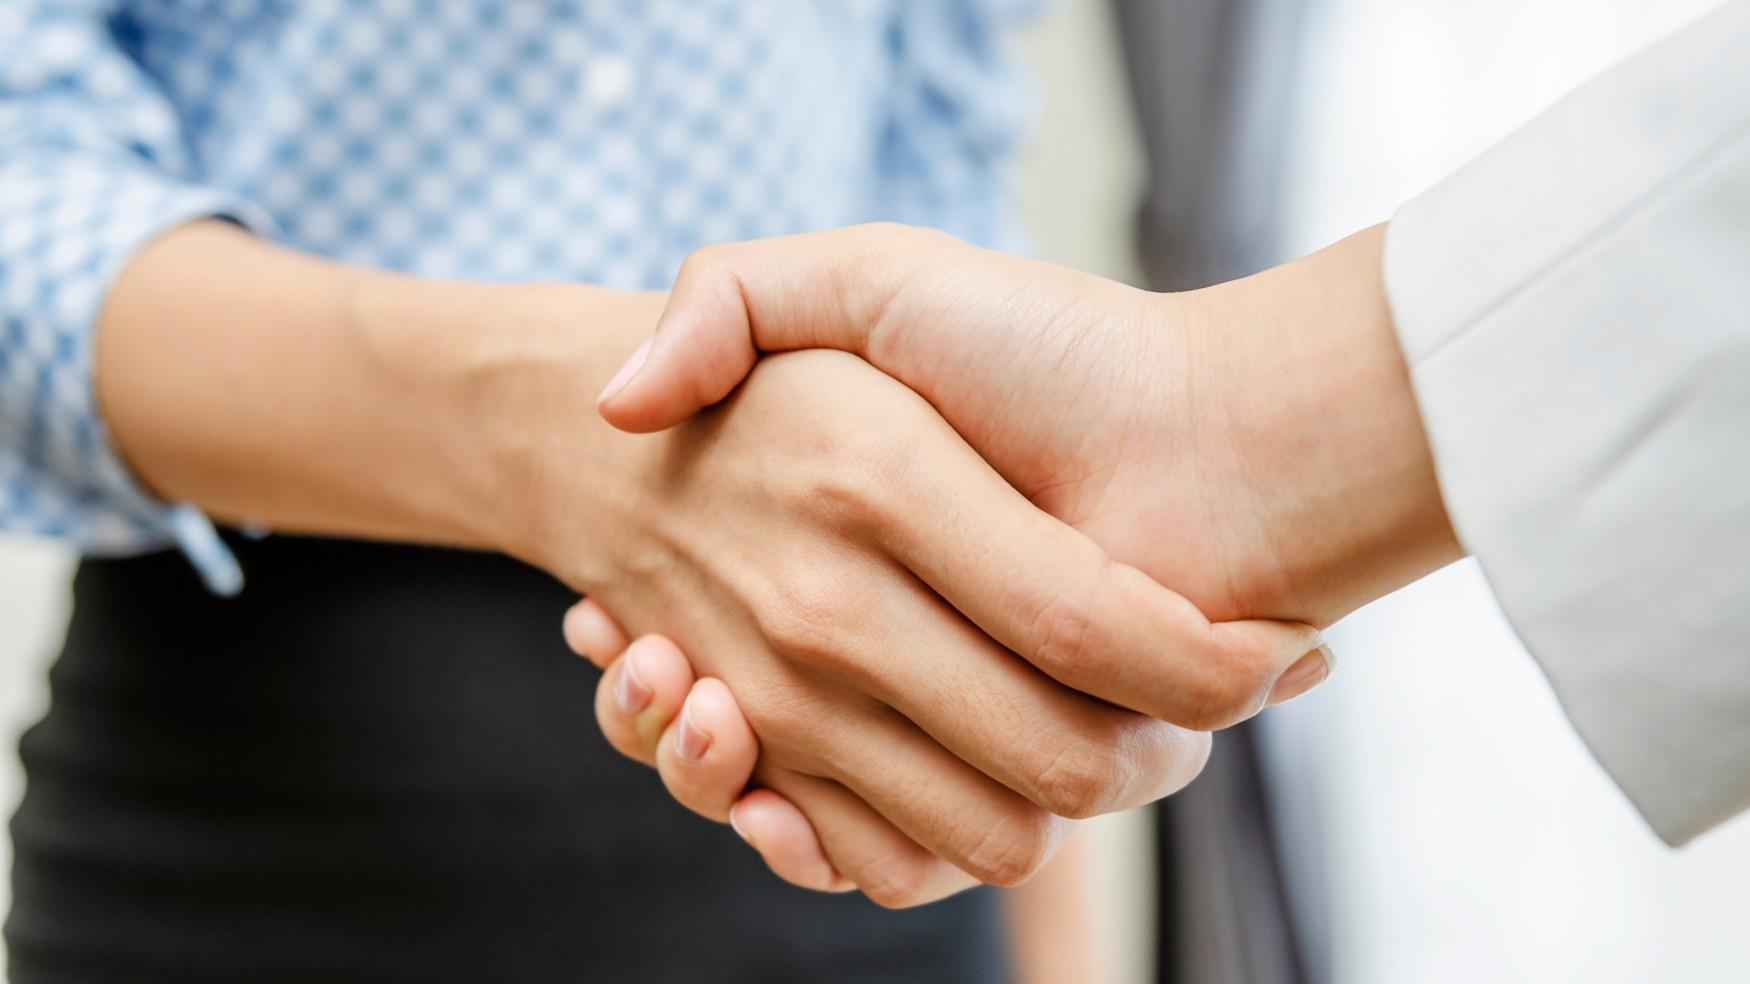 Typical at ERNI Handshake